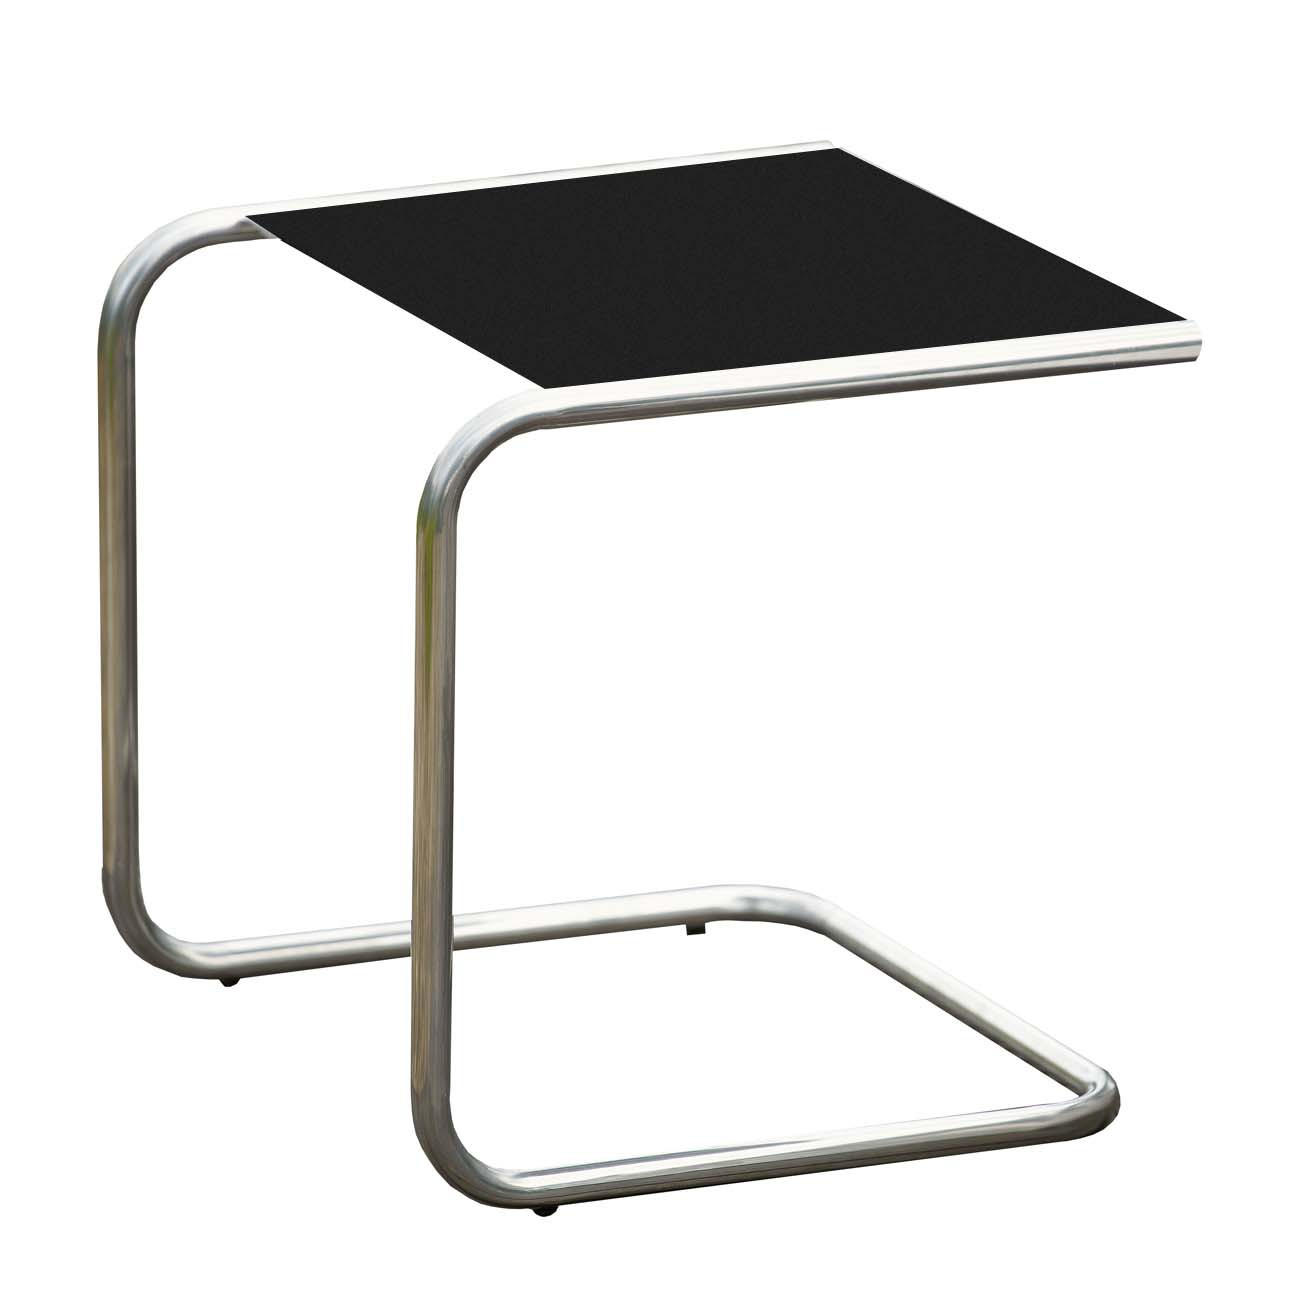 jan kurtz beistelltisch club aluminium schwarz 492169 eingang garten gartenm bel beistelltische. Black Bedroom Furniture Sets. Home Design Ideas